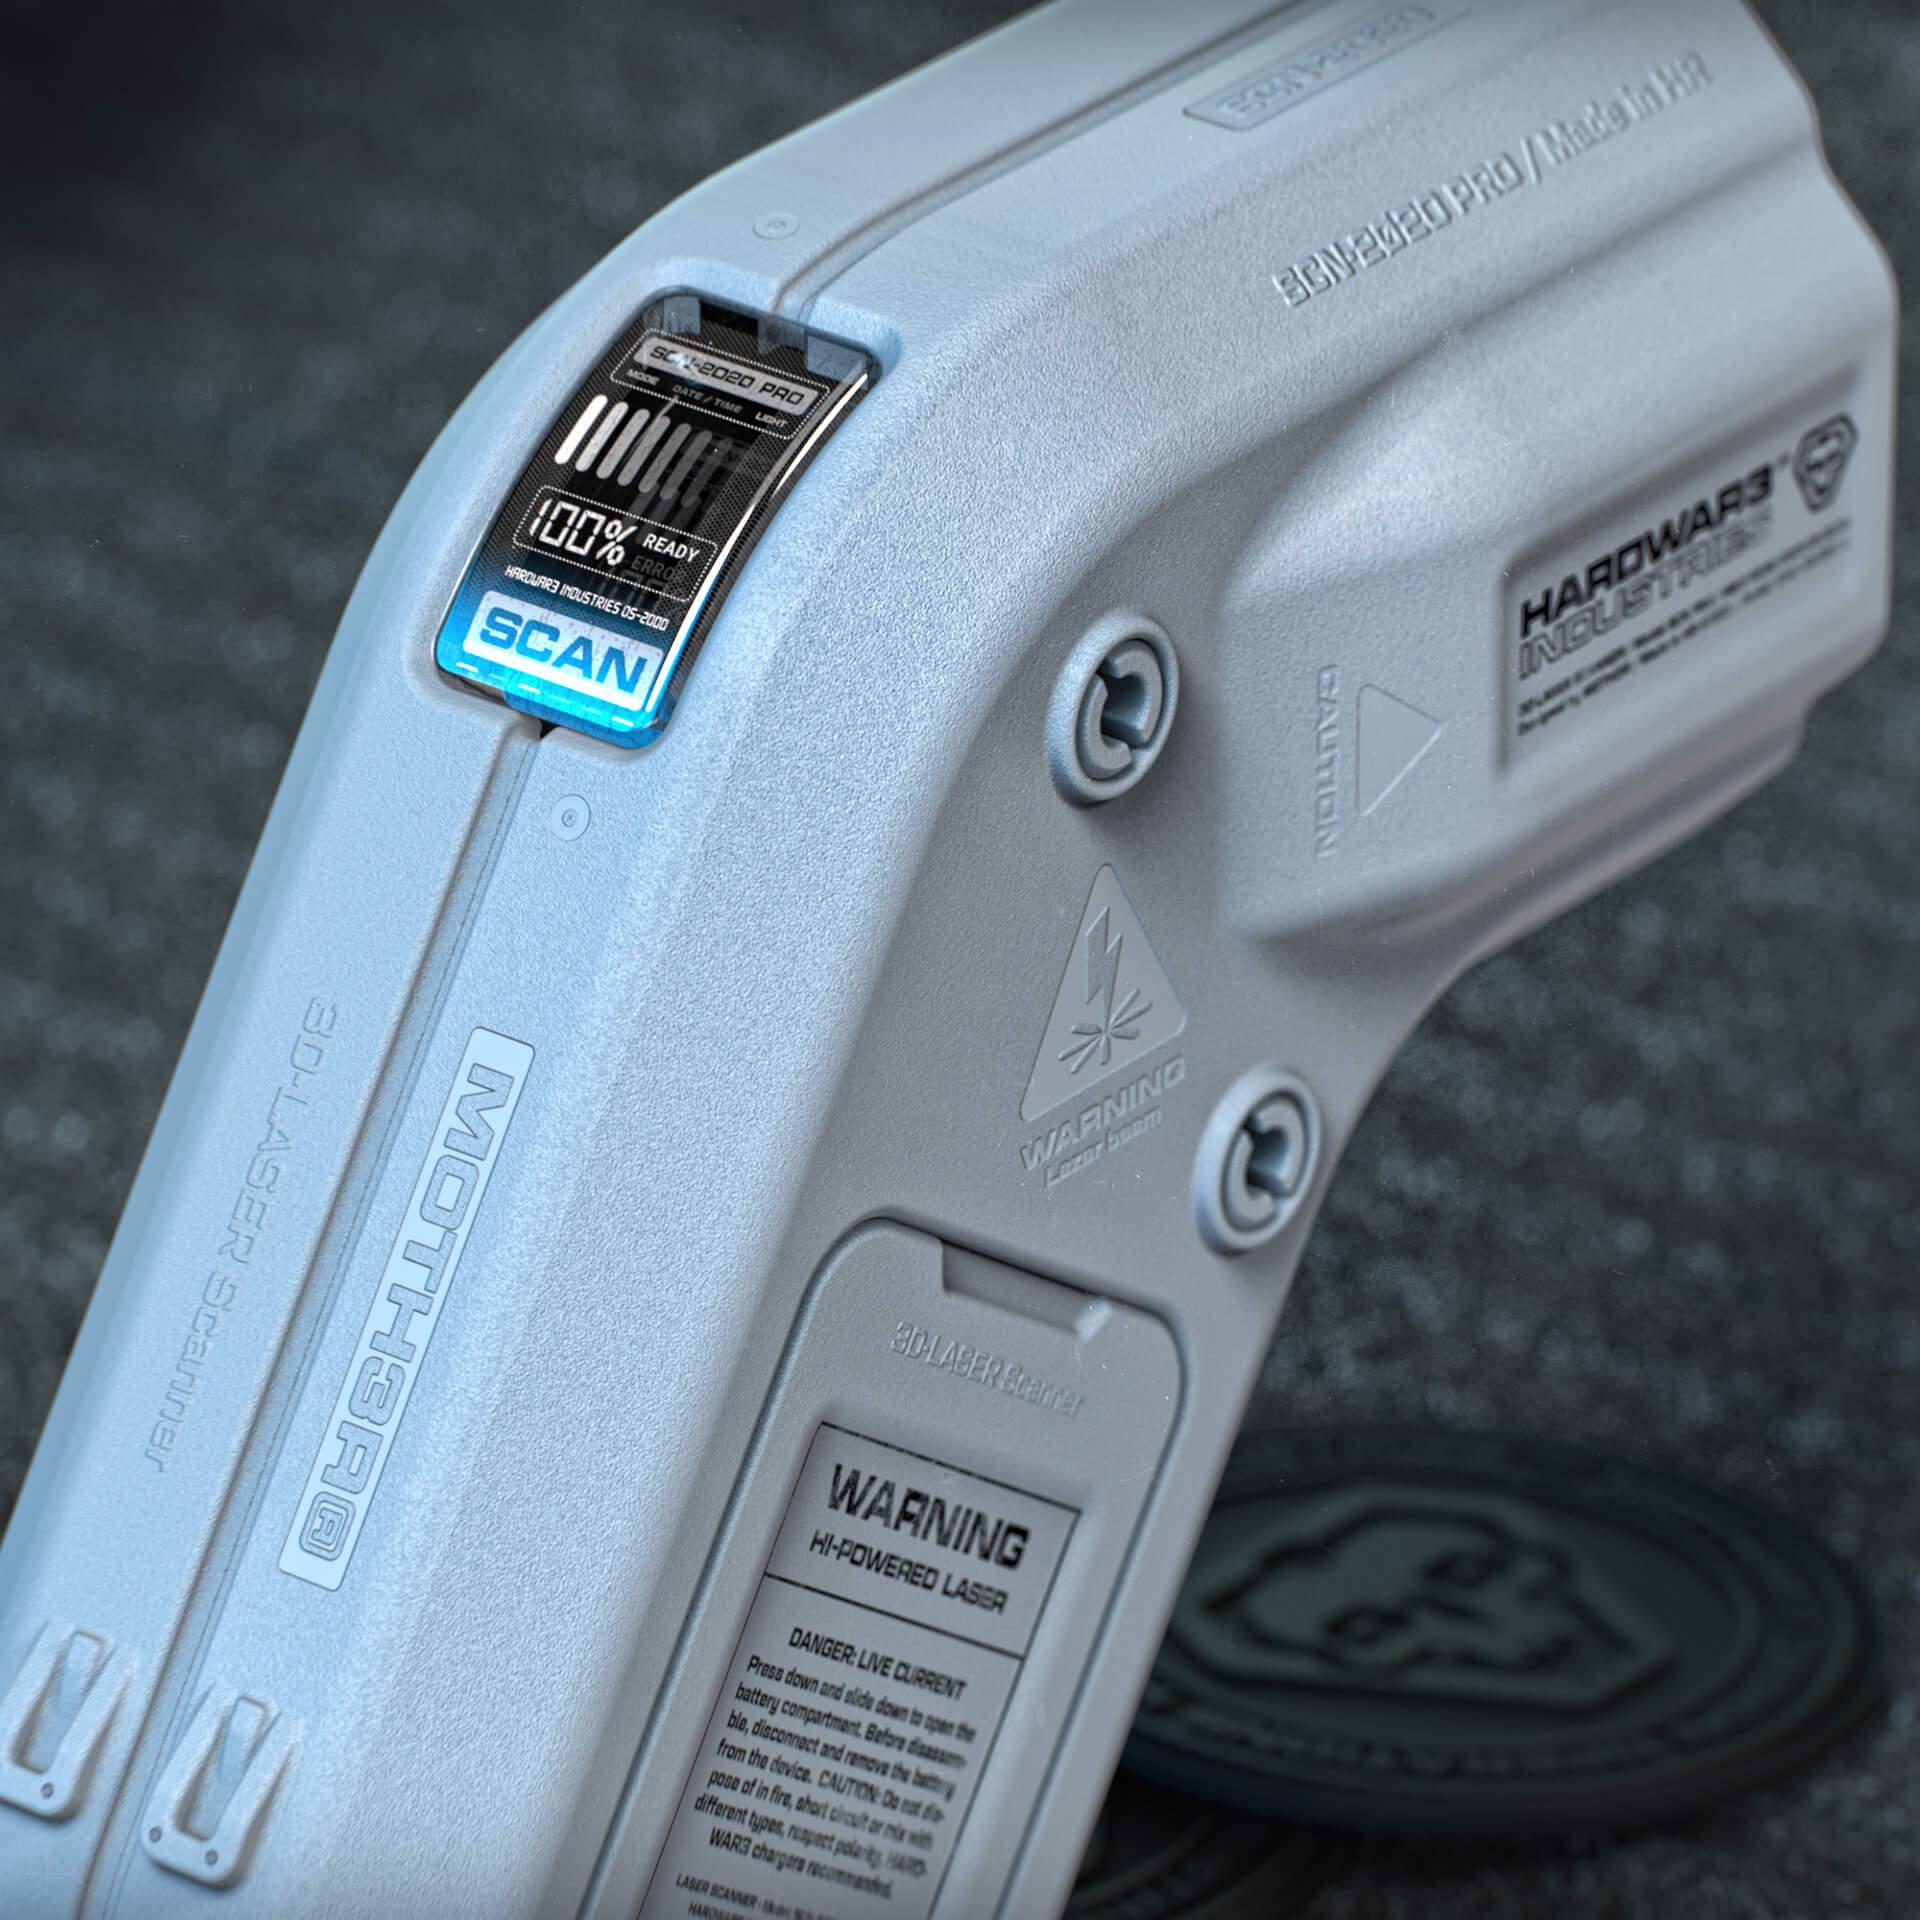 Scanner-001.92-Clean